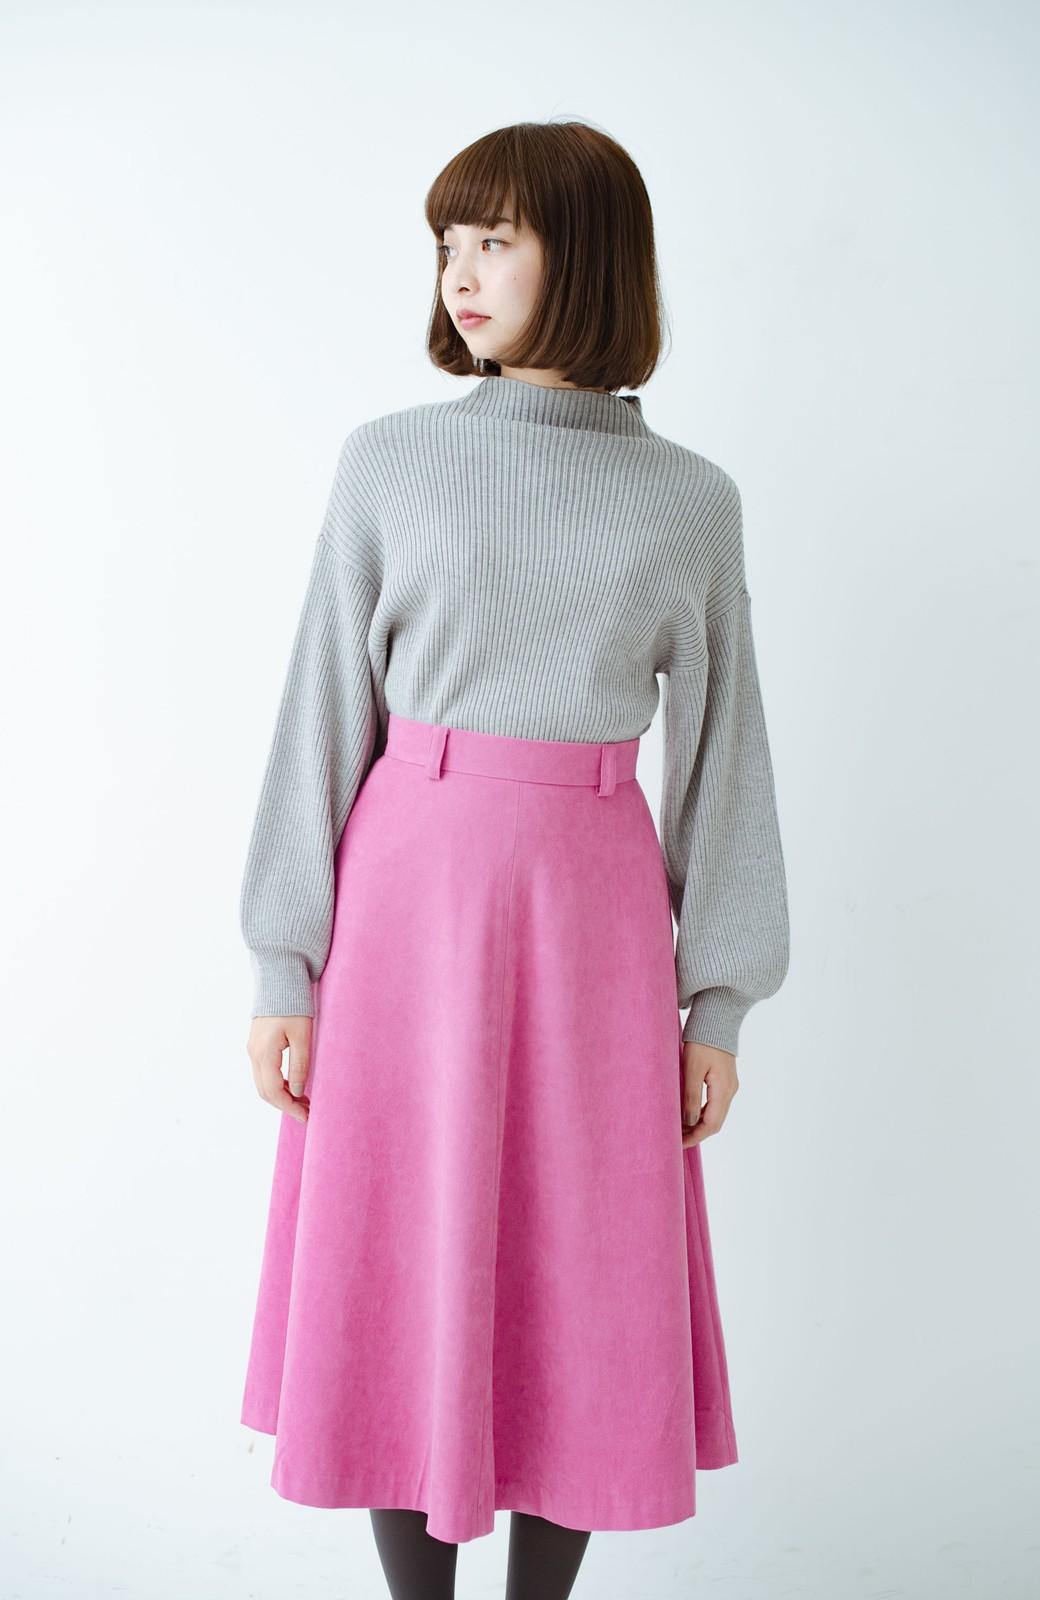 haco! 女っぽく上品に見える フレアースカート by que made me <ピンク>の商品写真13